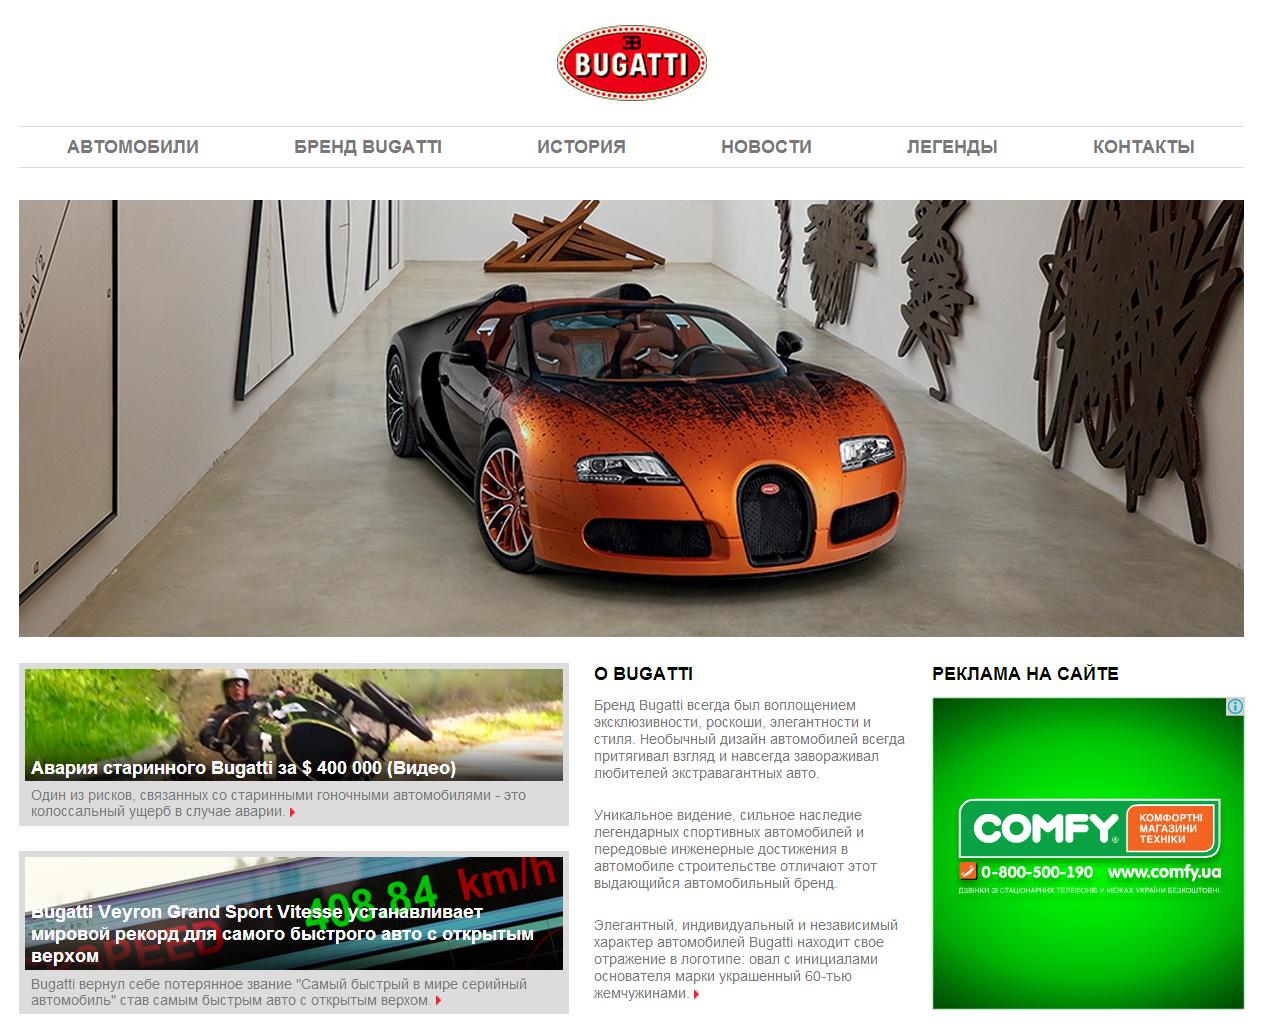 Создание сайта про автомобили Bugatti